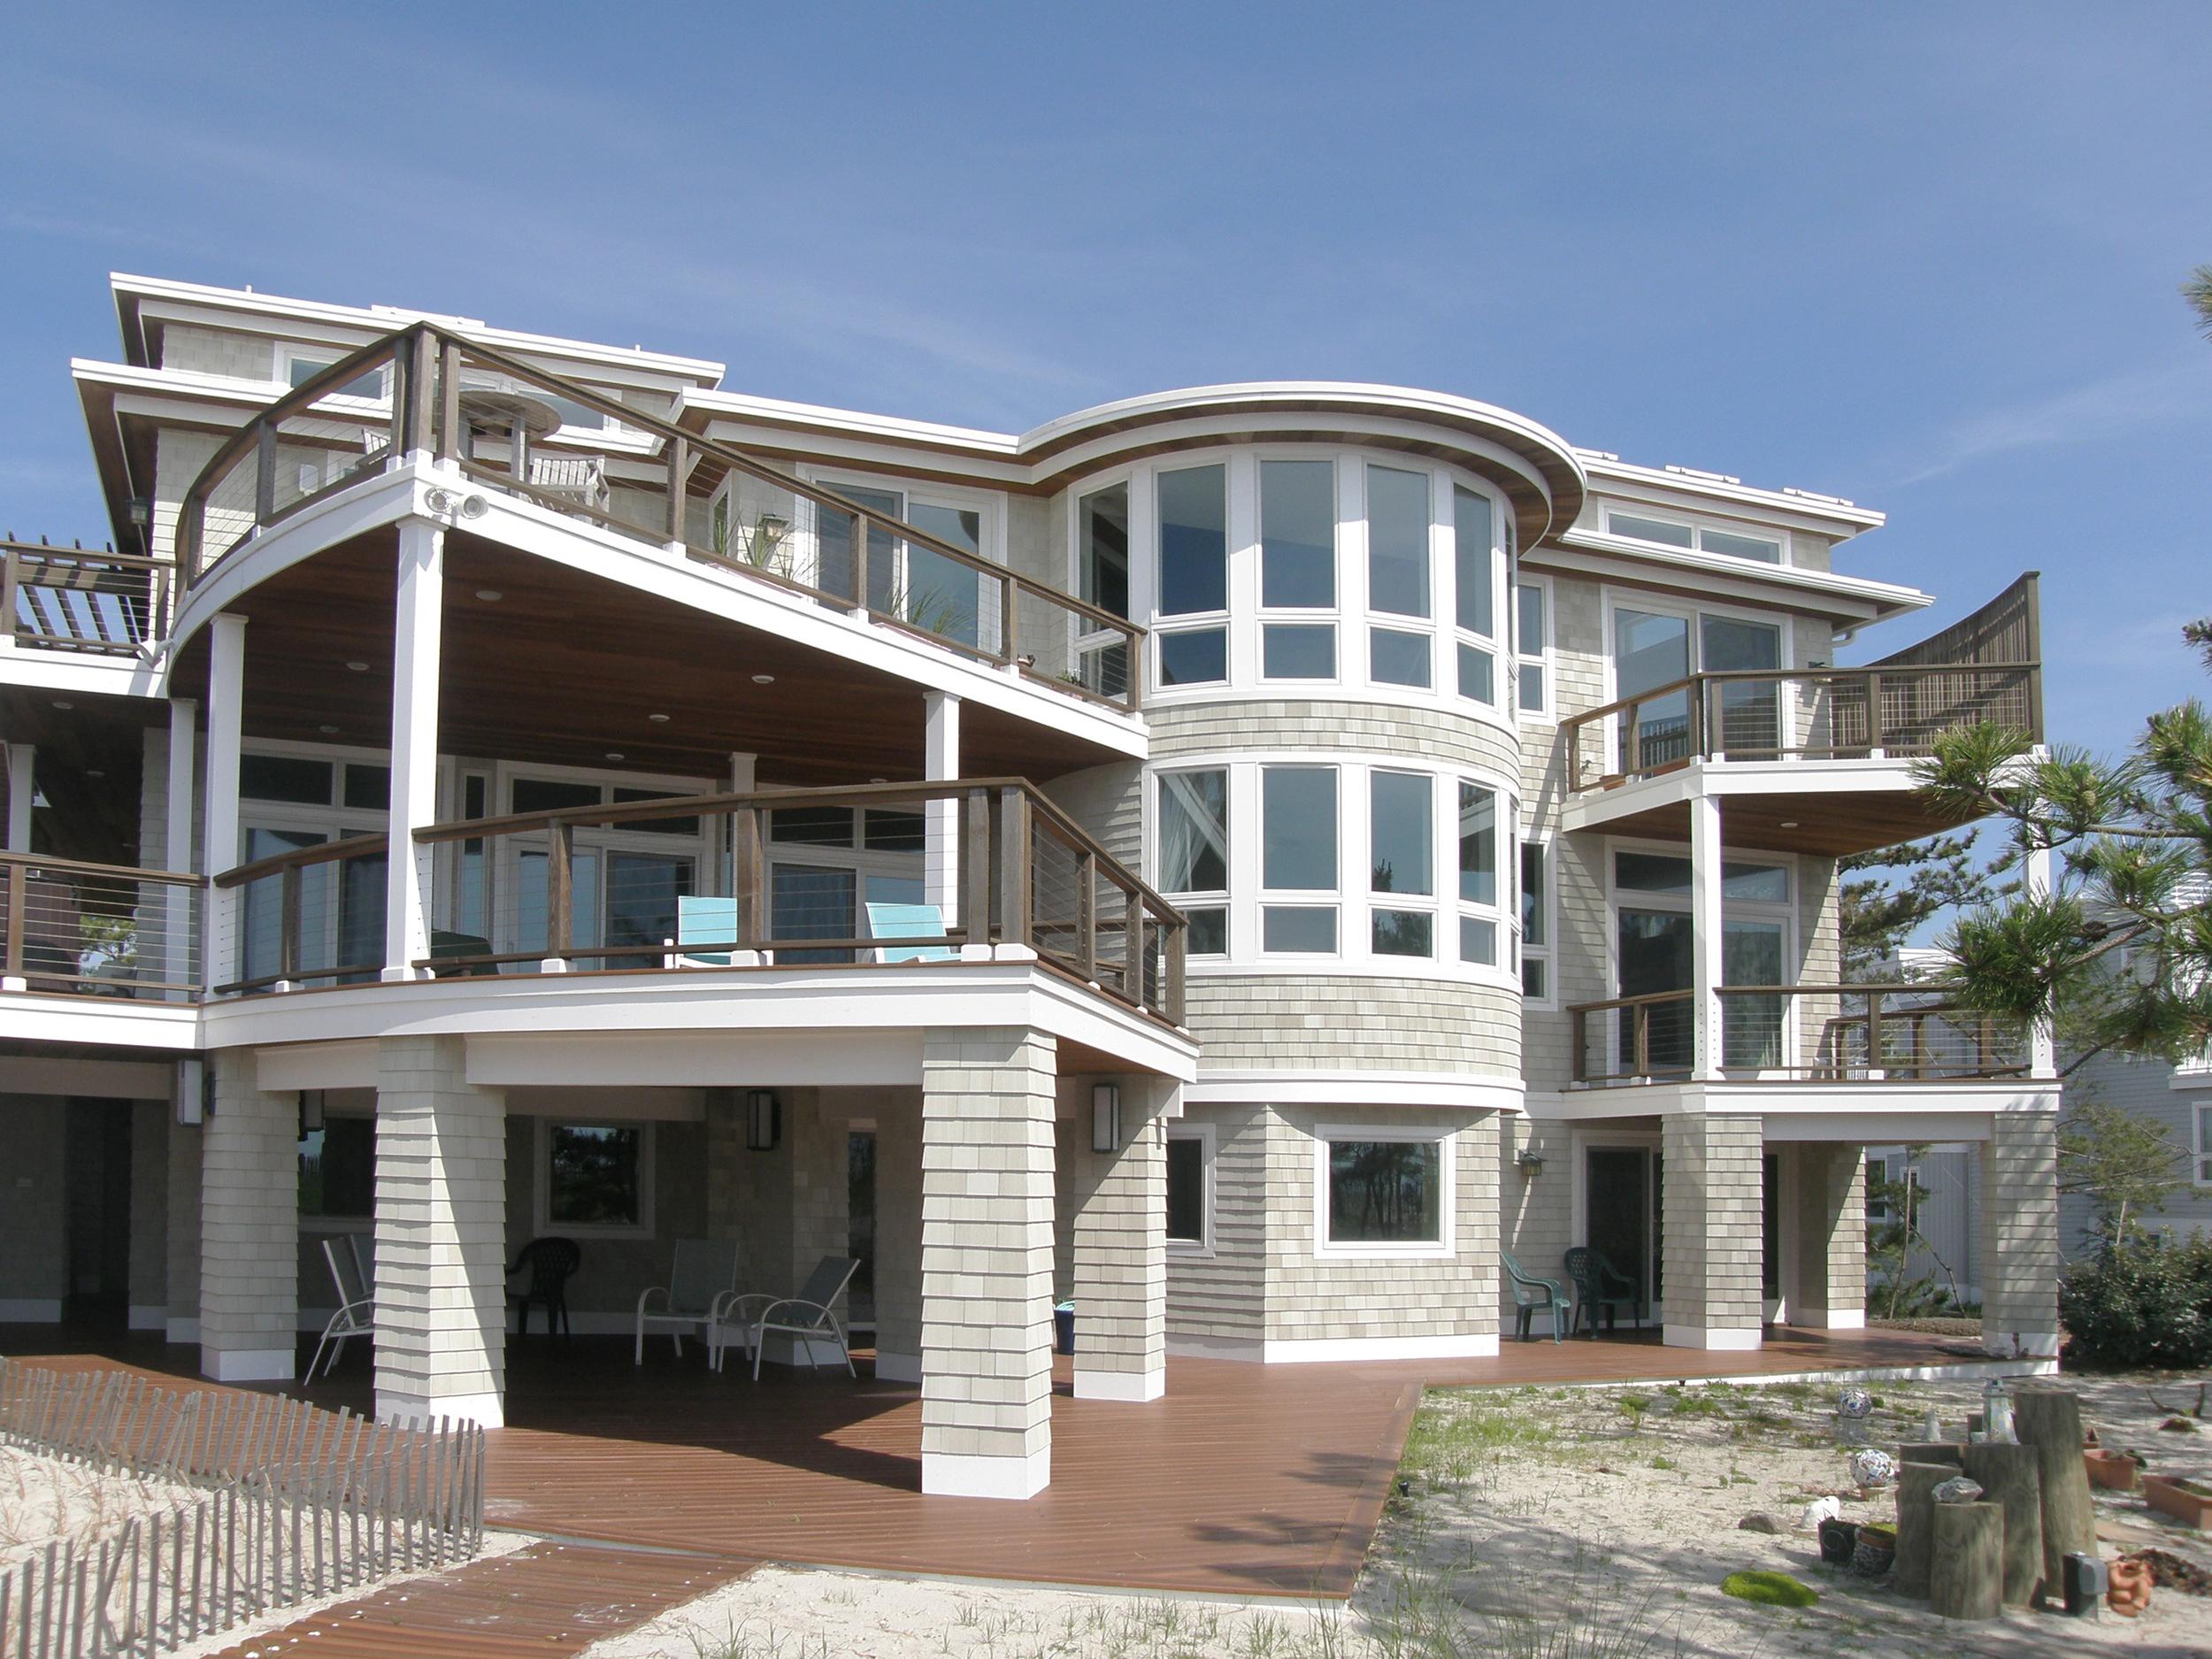 Nichols Residence (2010)